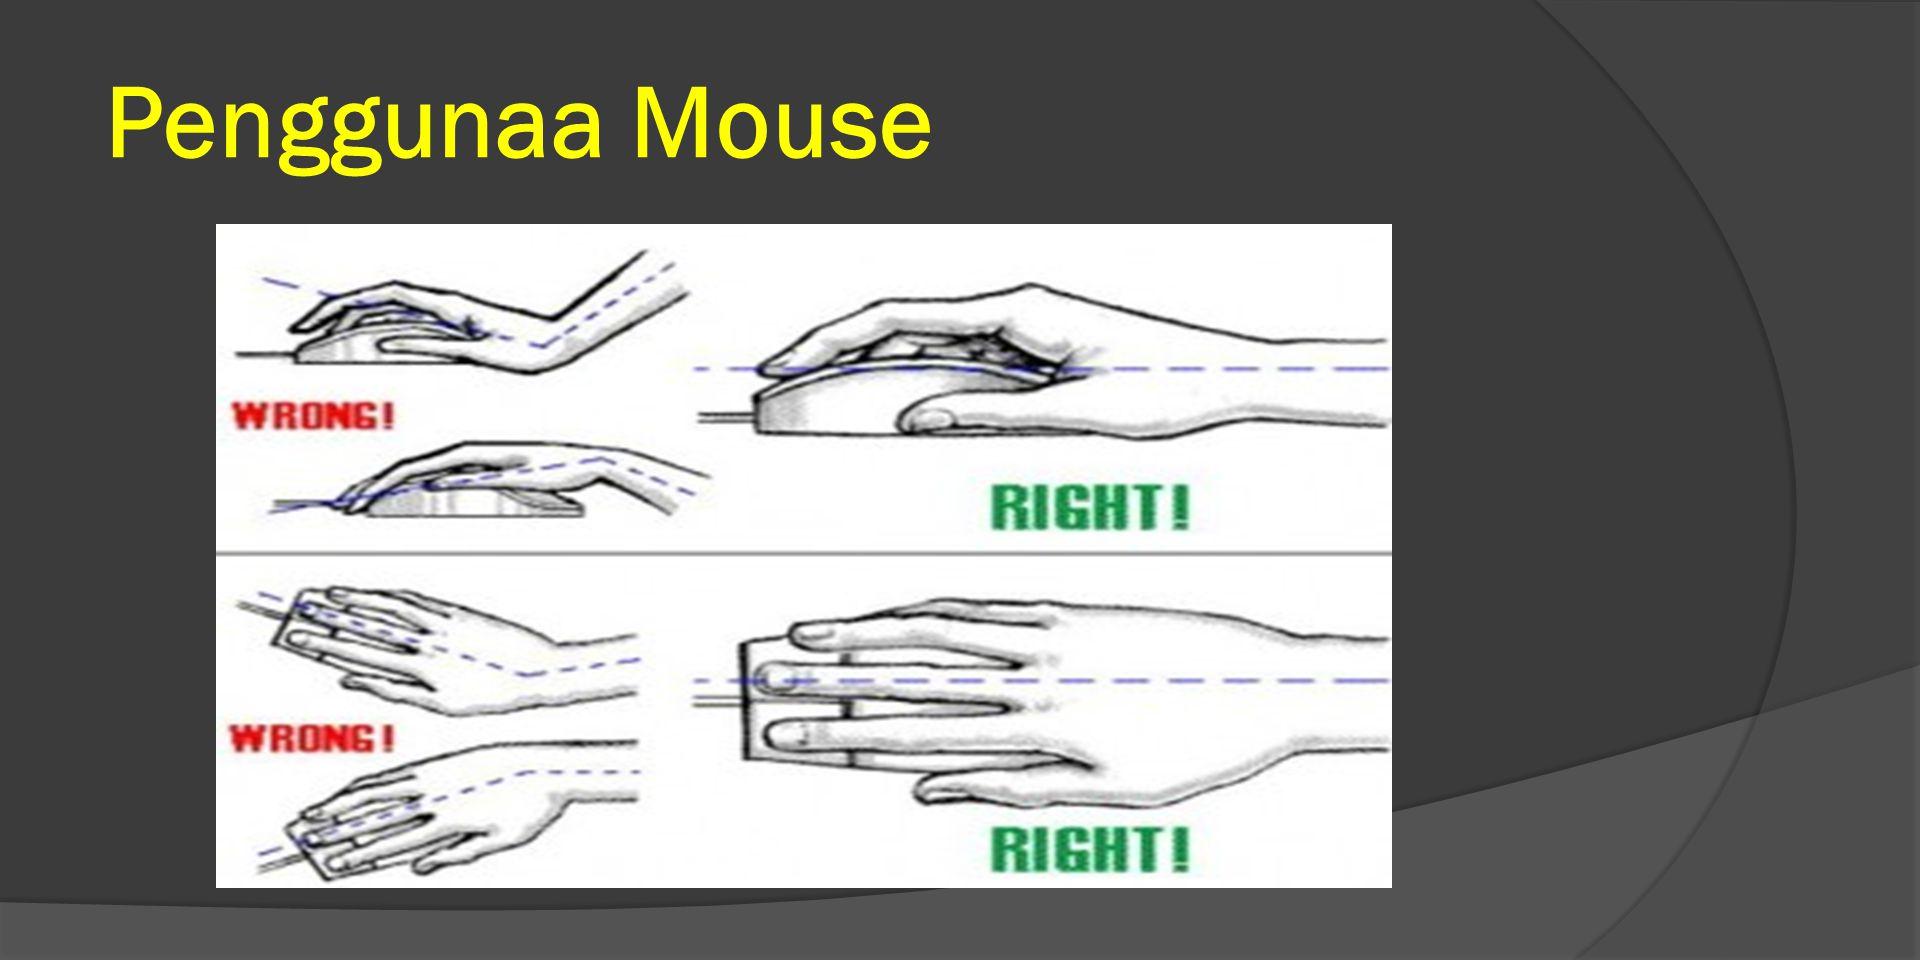 Penggunaa Mouse